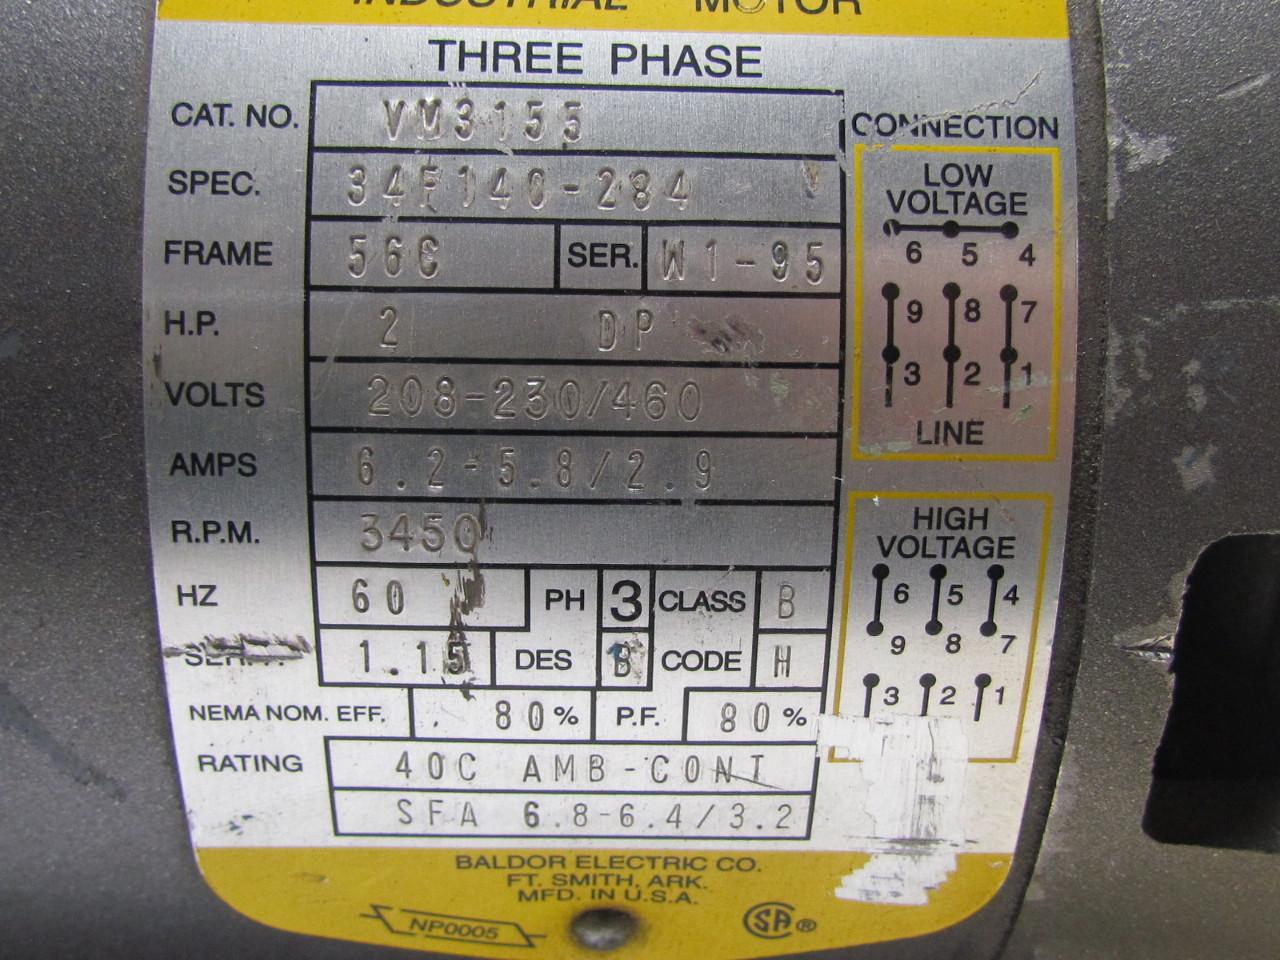 baldor ac motor diagrams online wiring diagrambaldor dc motor wiring diagrams wiring librarybaldor motors wiring diagram caferacersjpg com baldor l1410t capacitor wiring